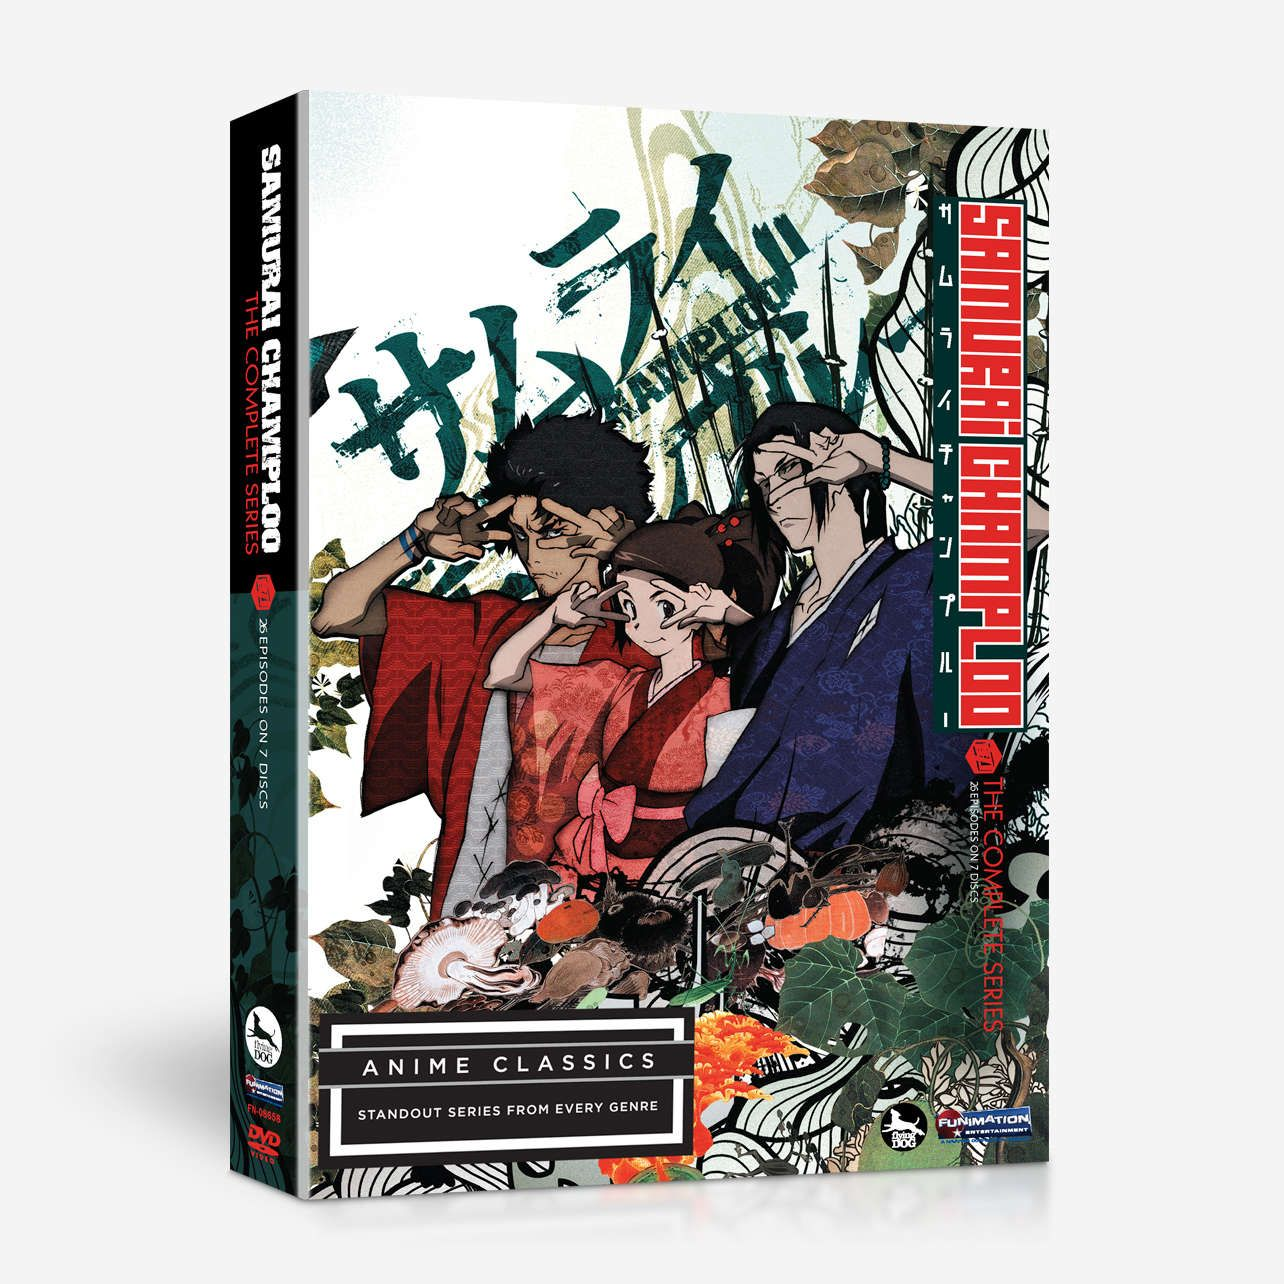 Samurai Champloo The Complete Series Anime Classics